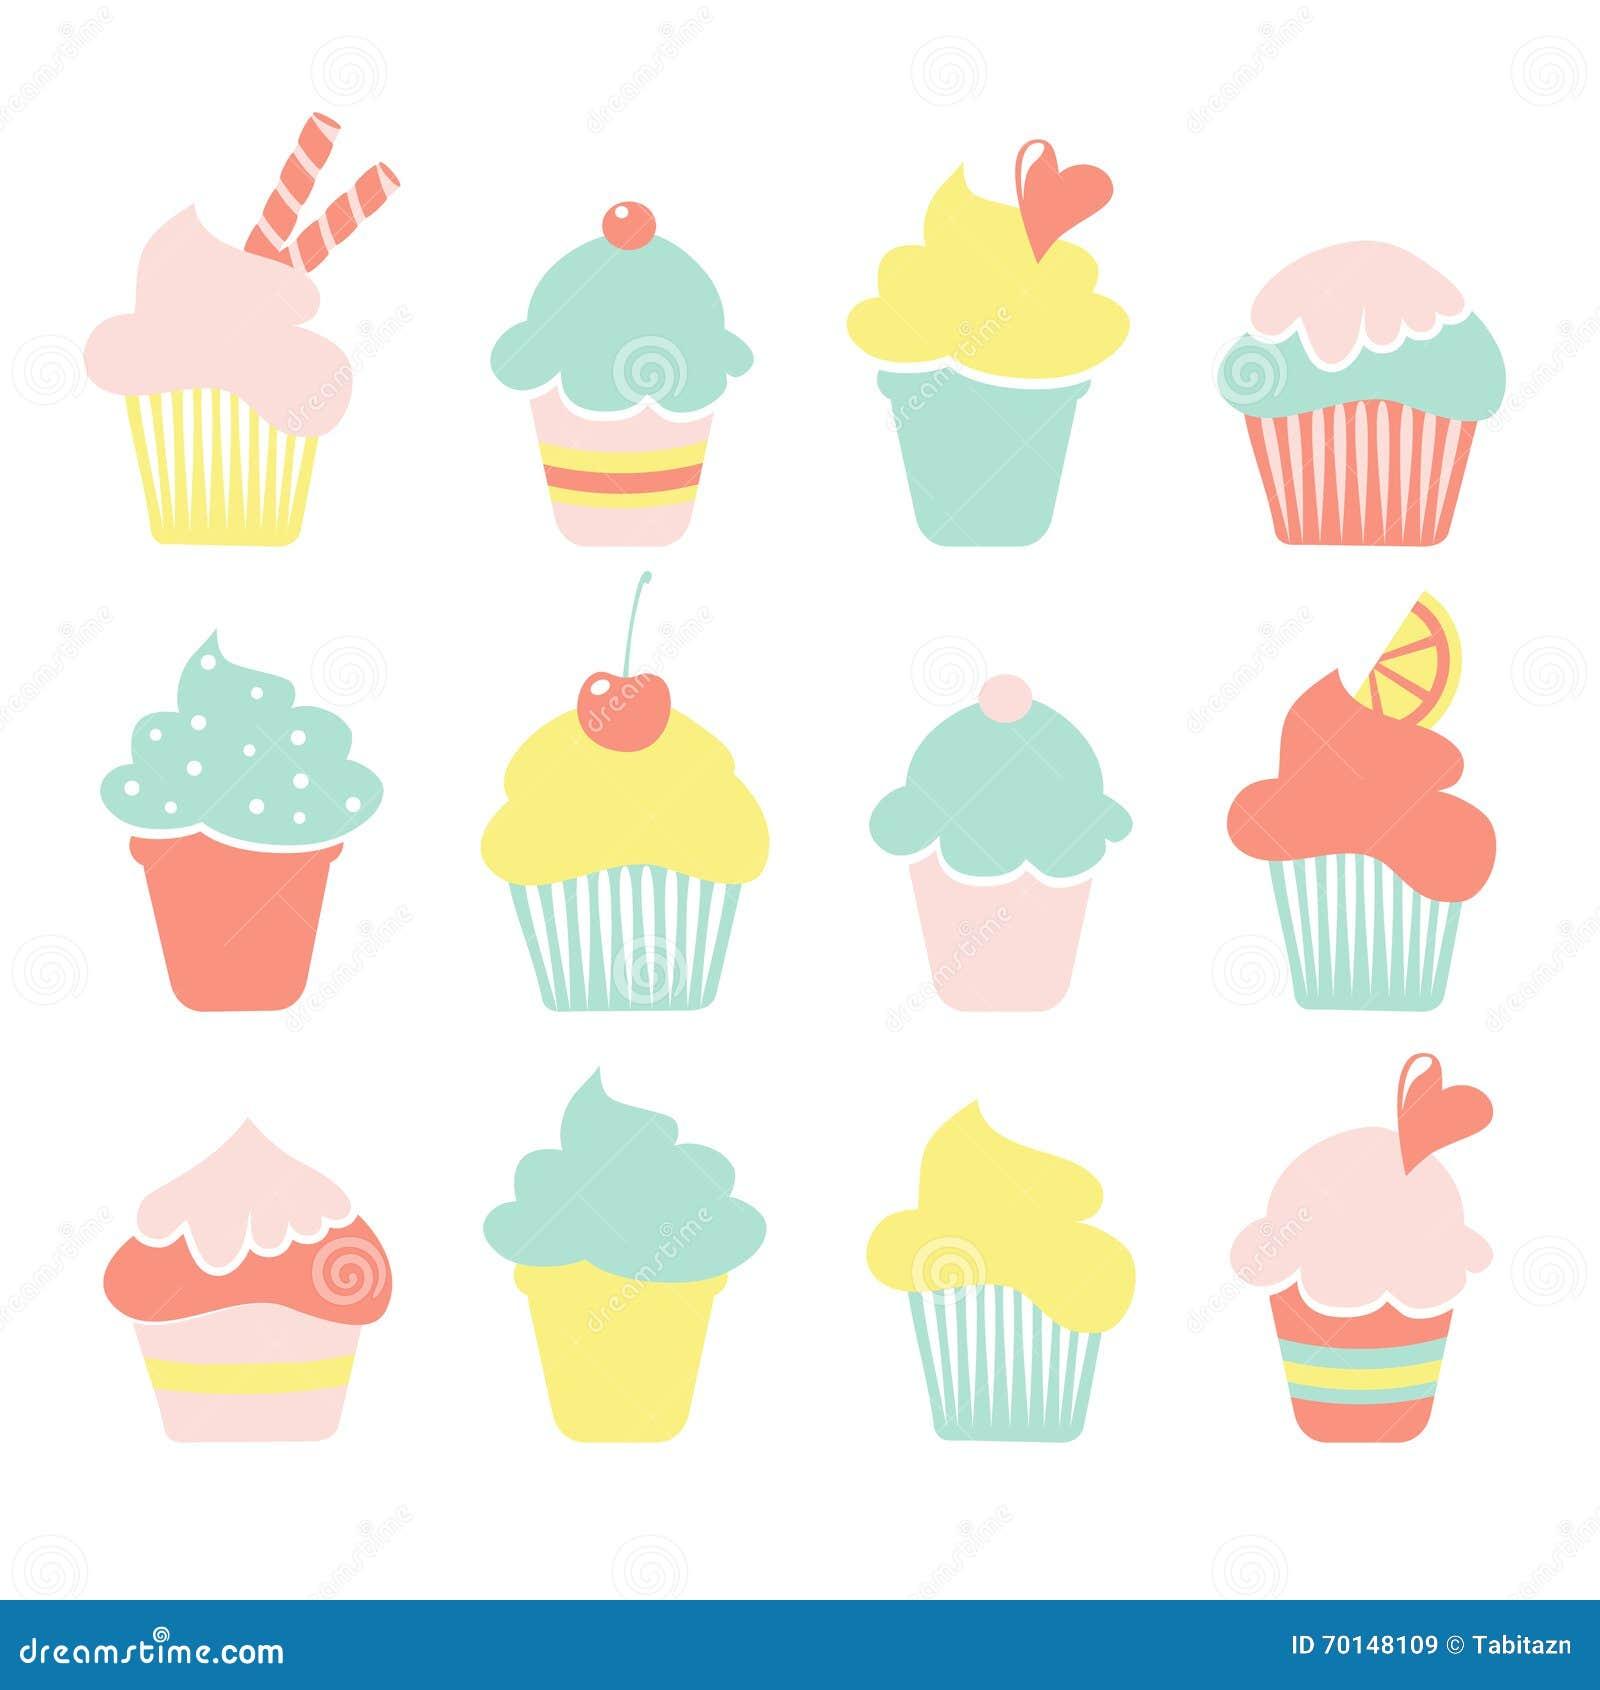 Icecream Cone Cupcake Wallpapers Mobile Pics: Set Of Ice Cream, Sundae, Cupcake Icons In Pastel Colors